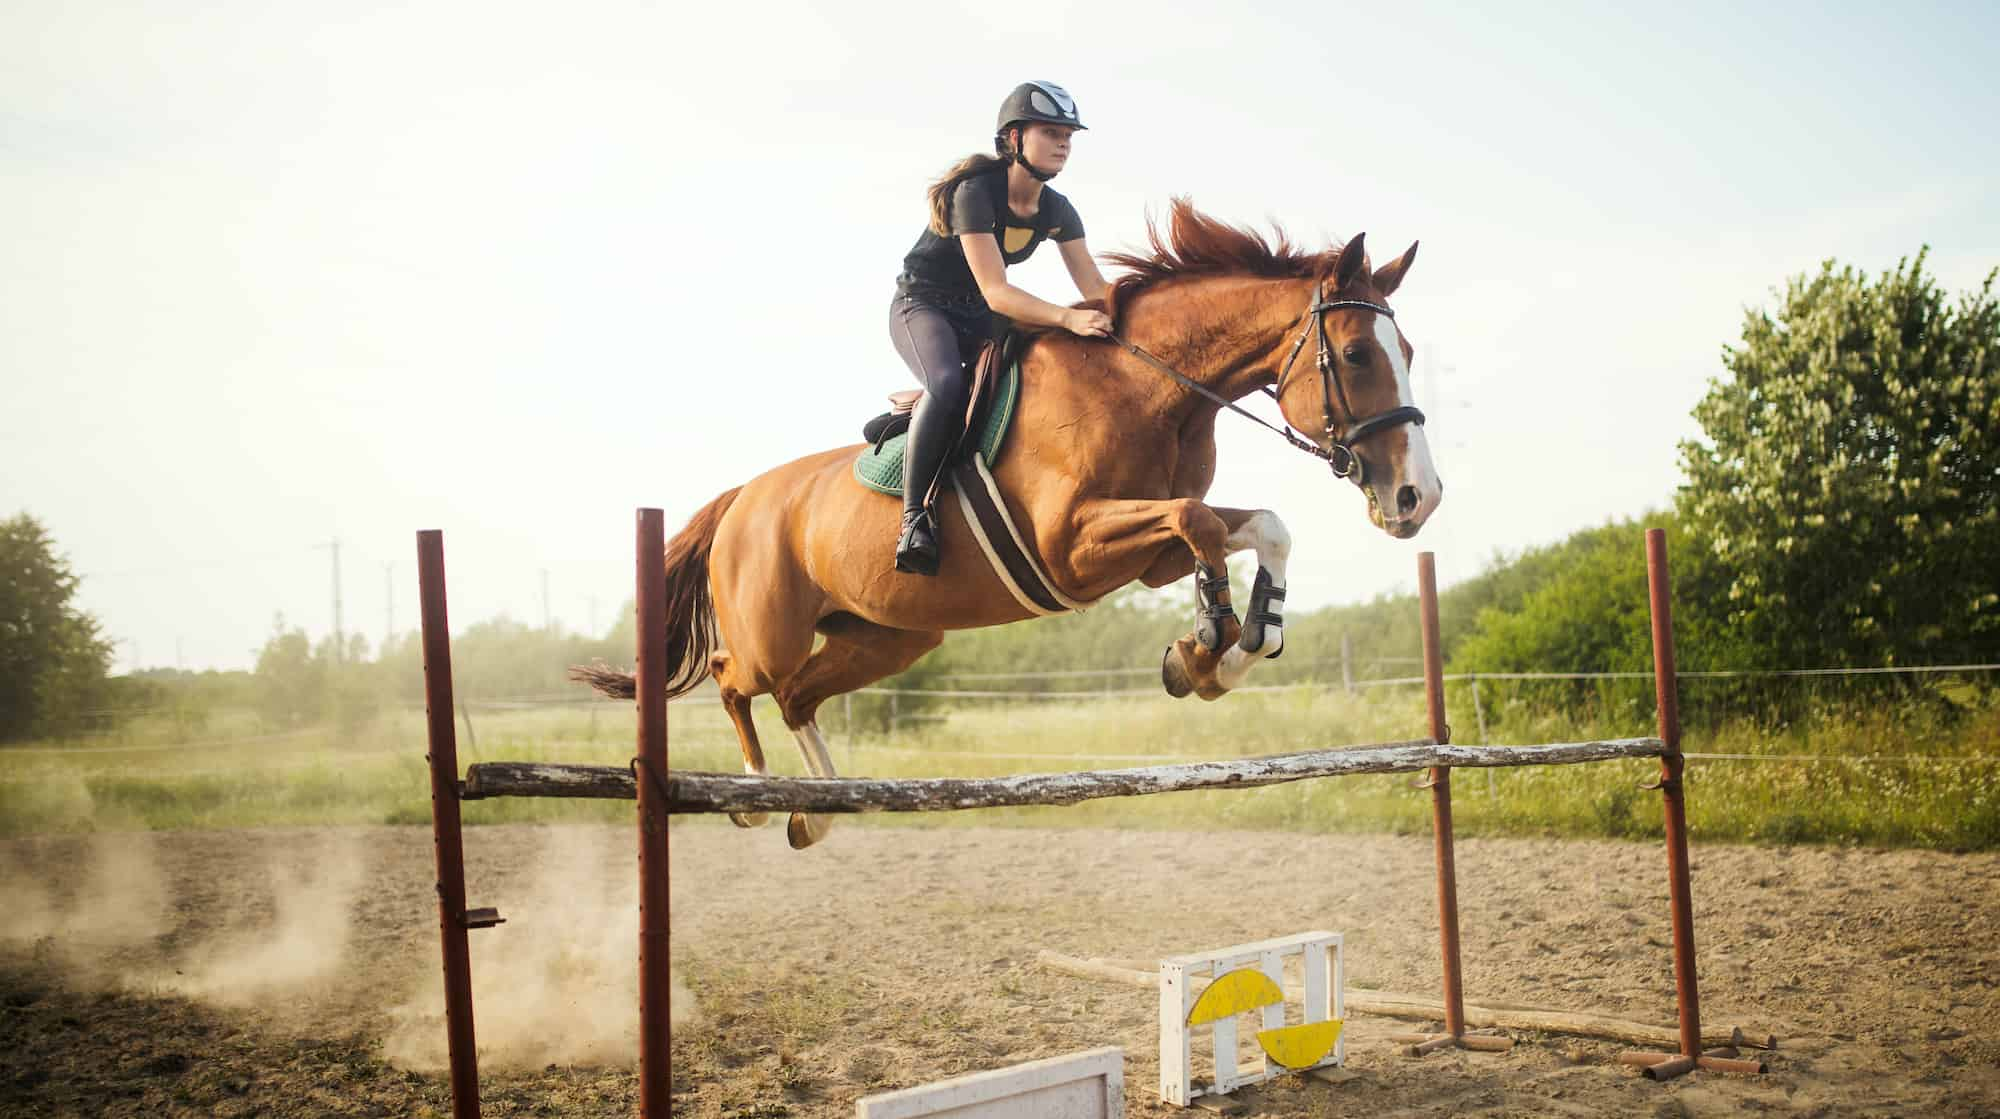 young female jockey on horse leaping over hurdle 8SHLQA3